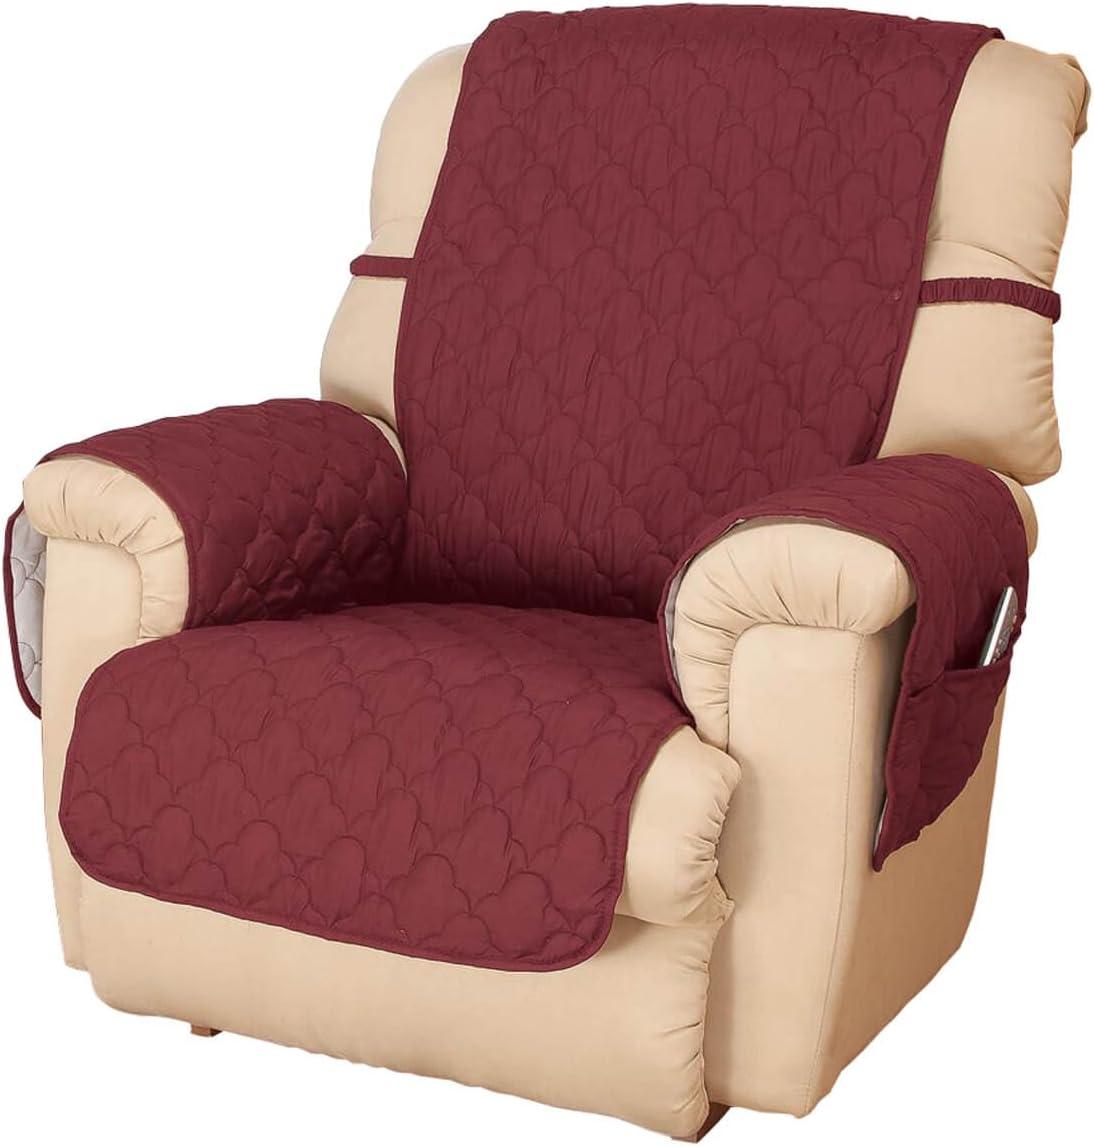 OakRidge Deluxe Microfiber Recliner Chair Cover, Burgundy